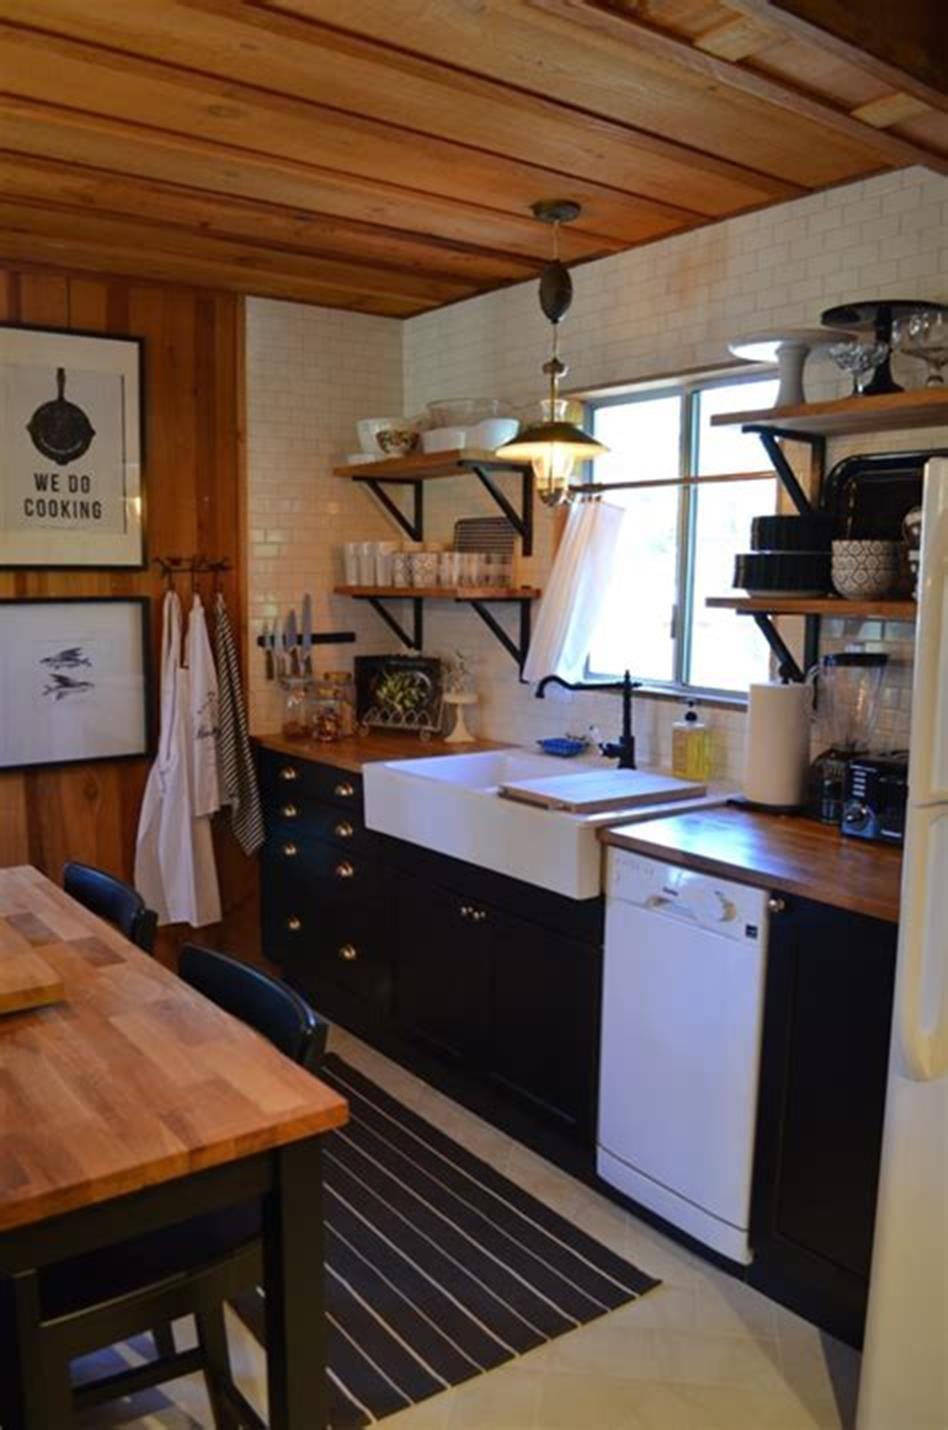 47 Inspiring Small Rustic Kitchen Design Ideas 2019   Log ...